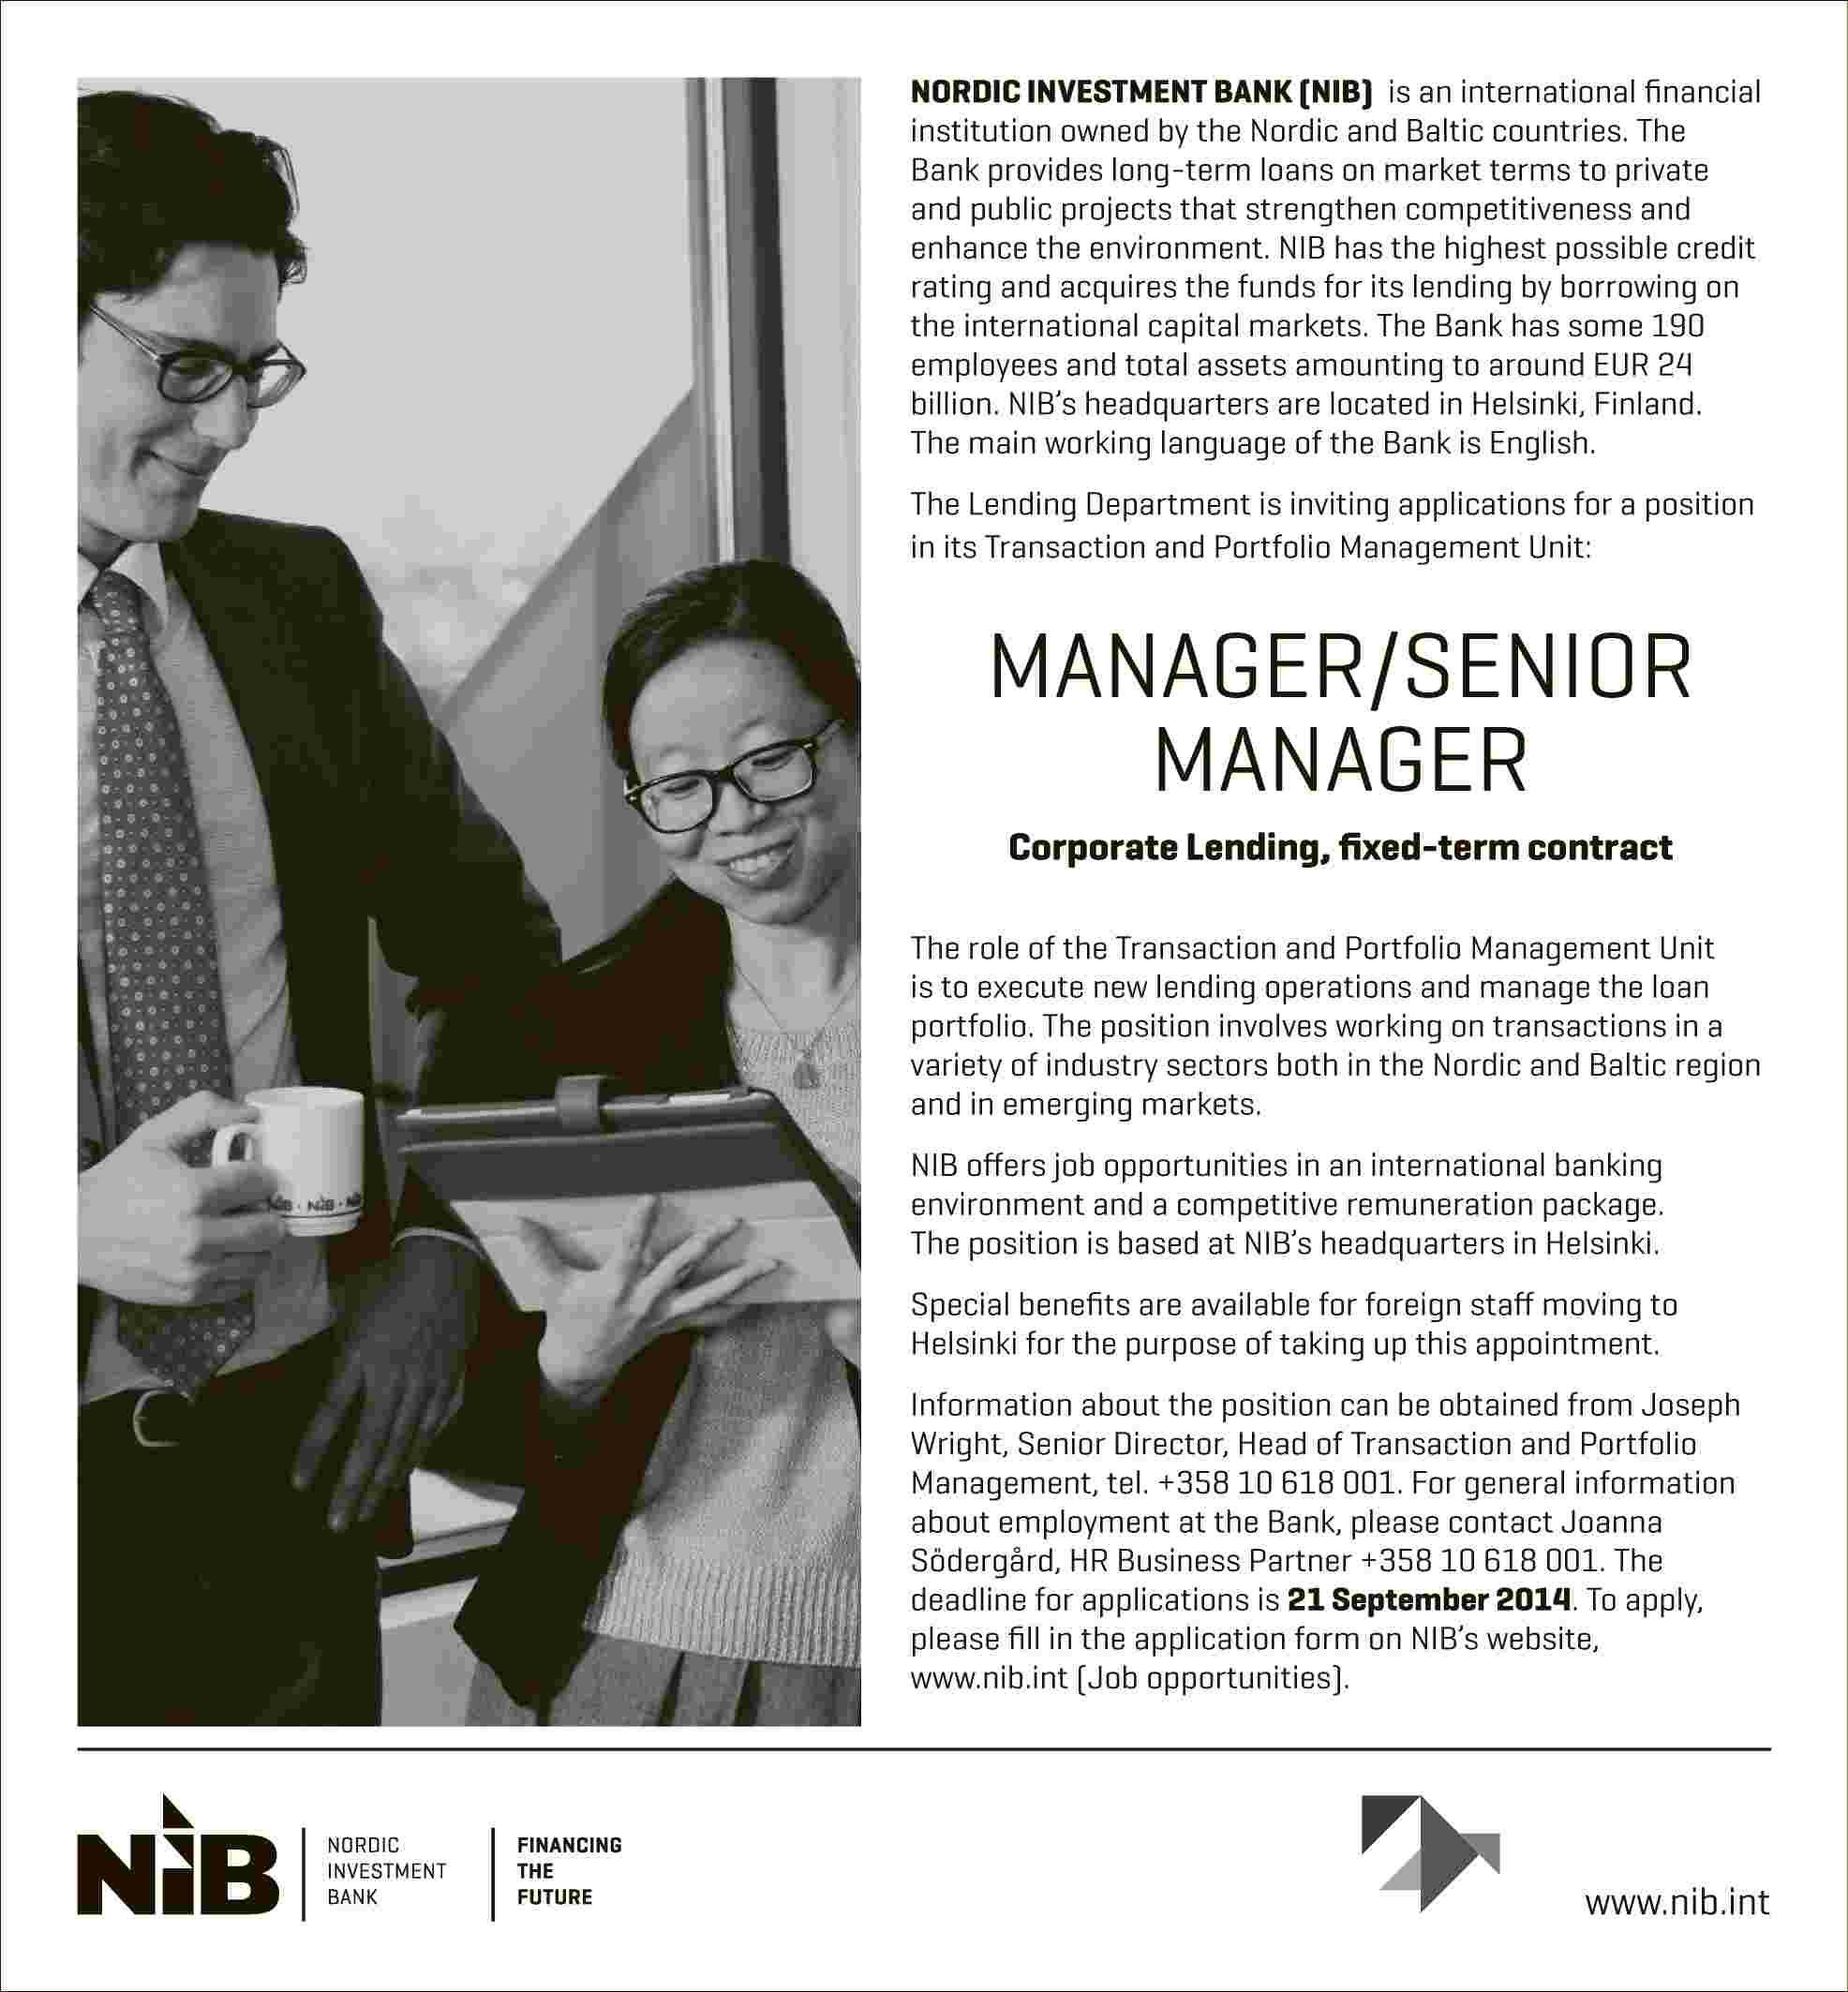 NIB: MANAGER / SENIOR MANAGER